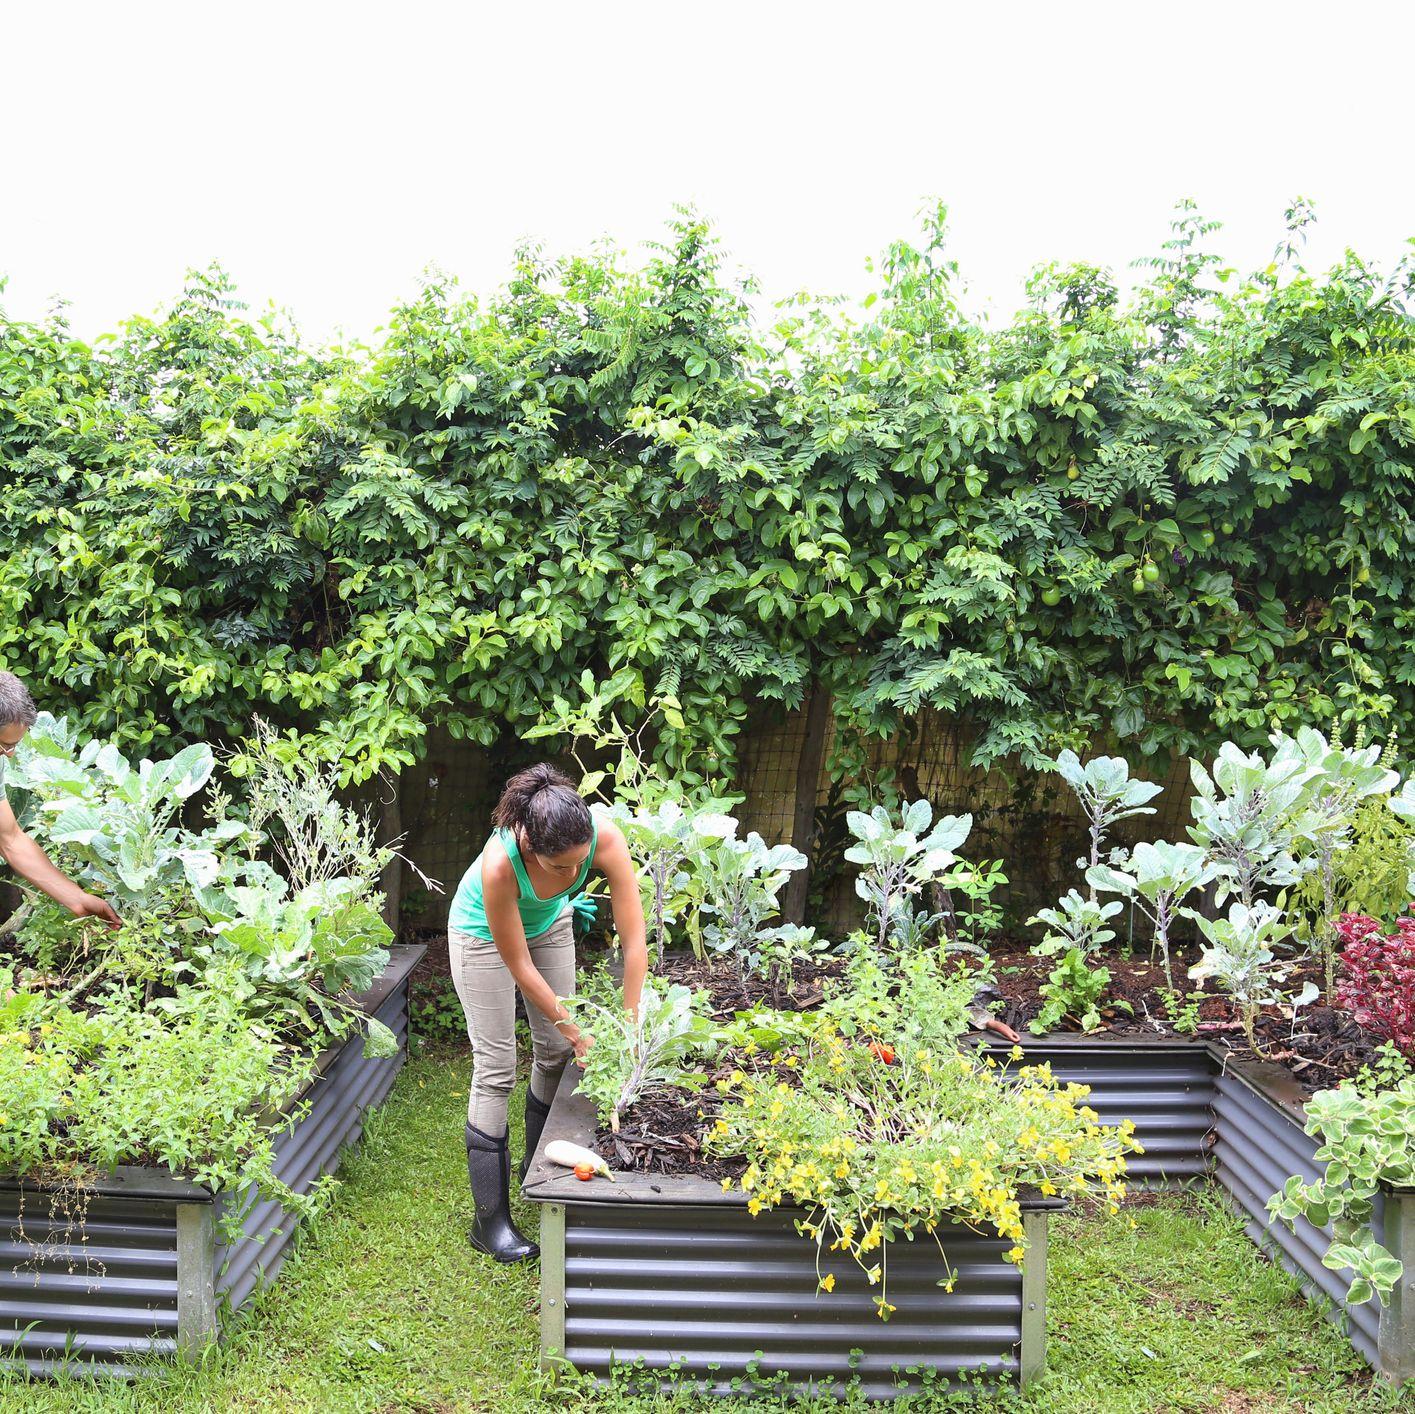 https://www popularmechanics com/home/lawn-garden/how-to/g92/build-raised-garden-beds/